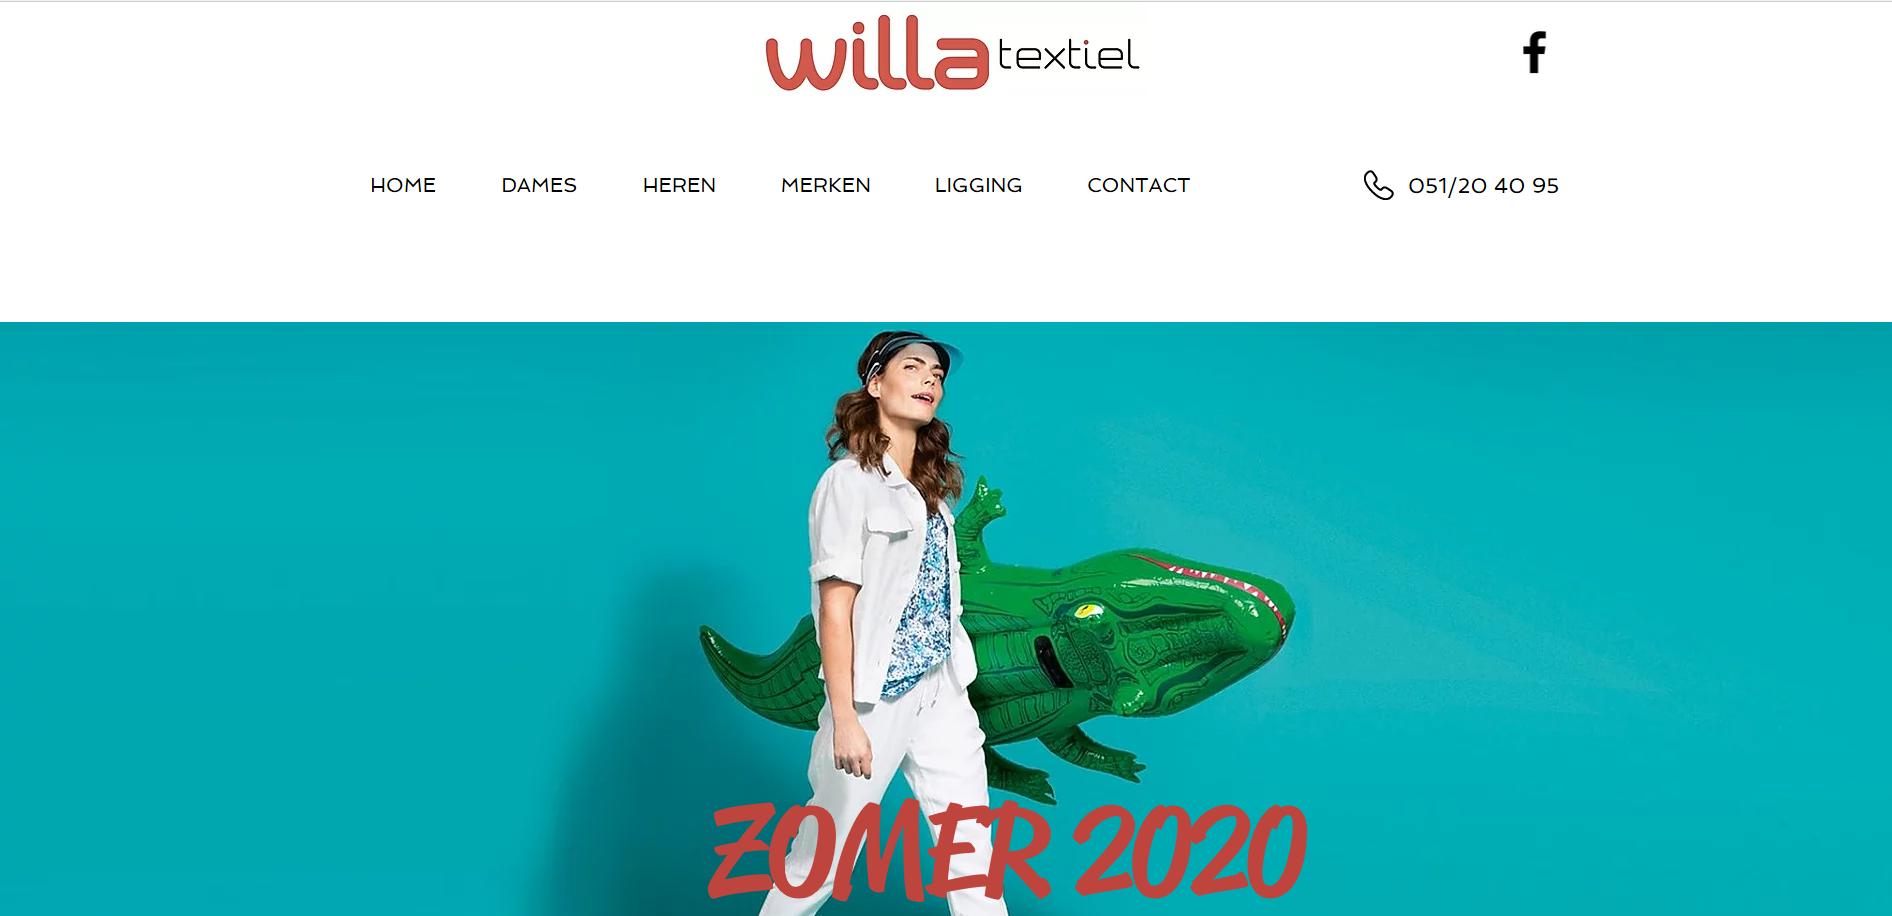 Willa textiel